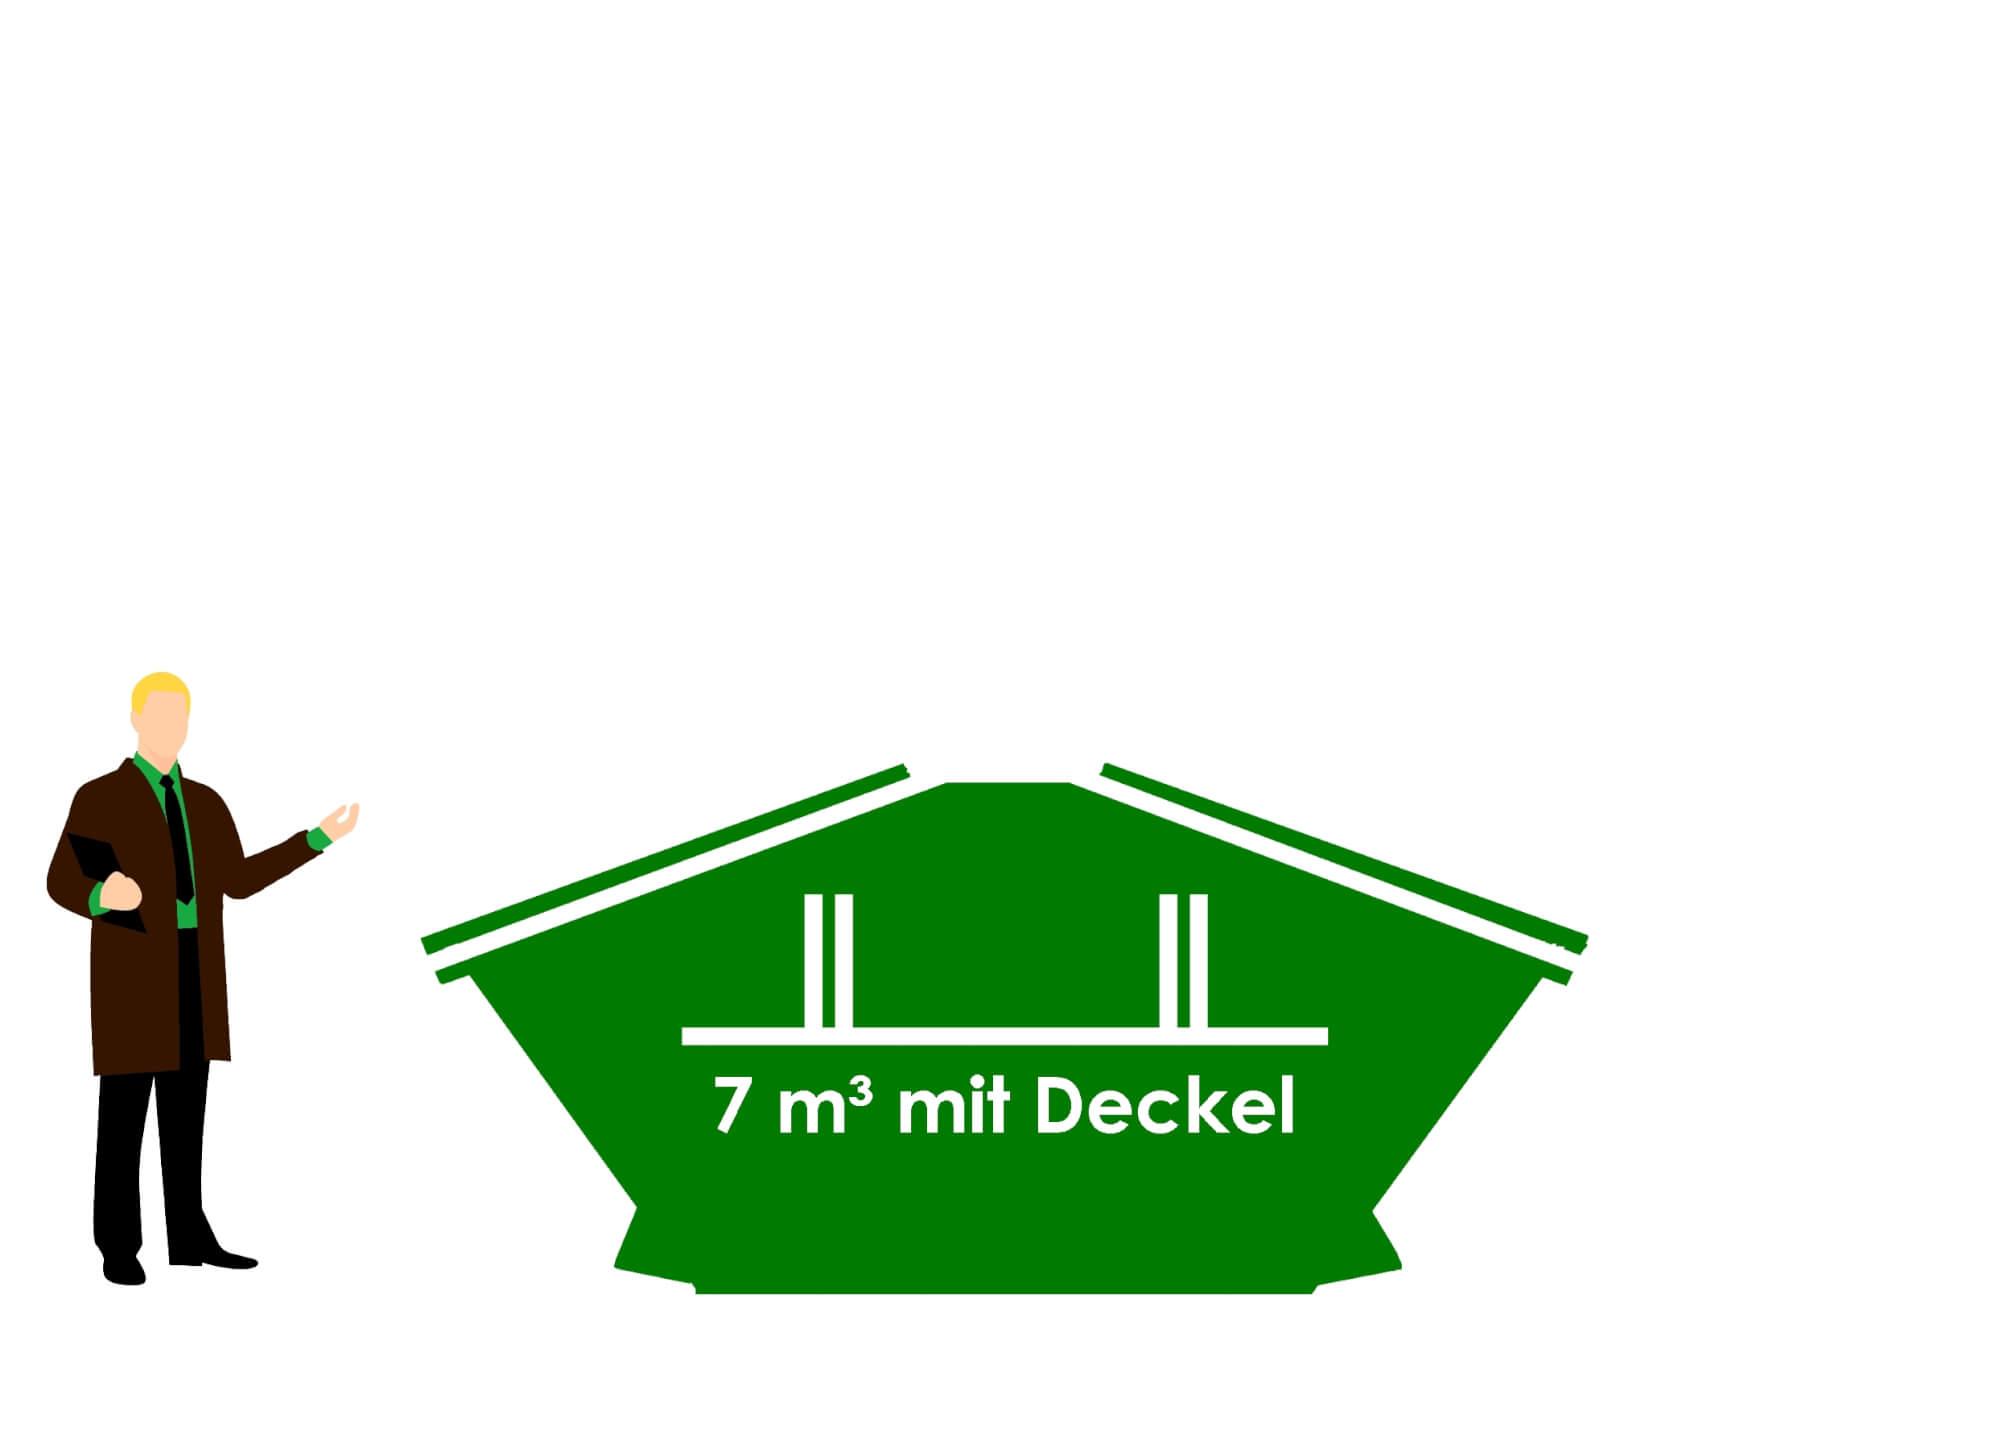 7m Deckel